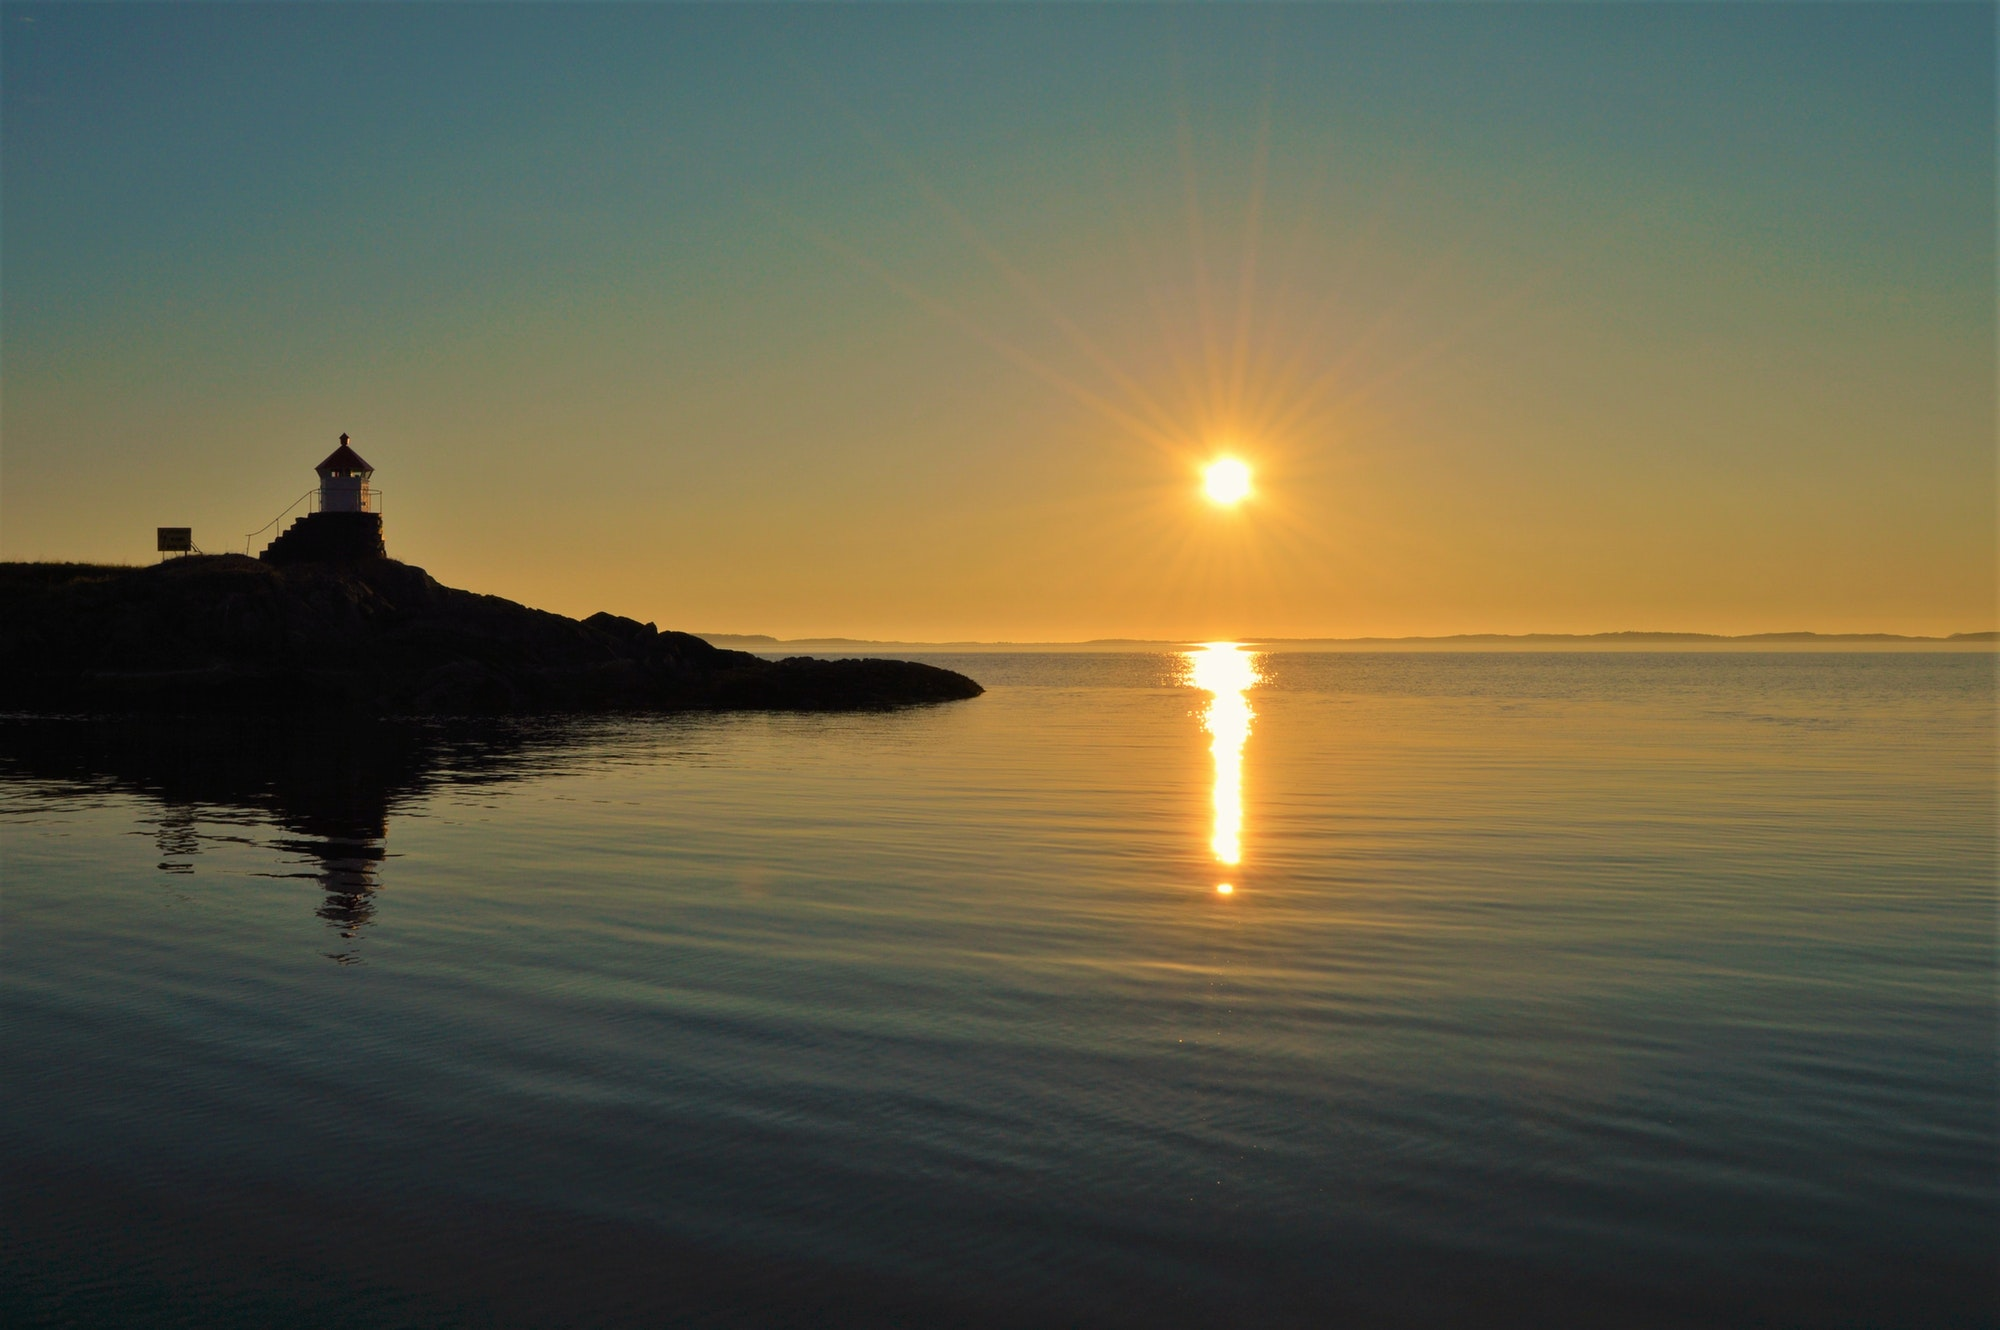 Lighthouse in the sunset, Kjerringøy - North of Norway